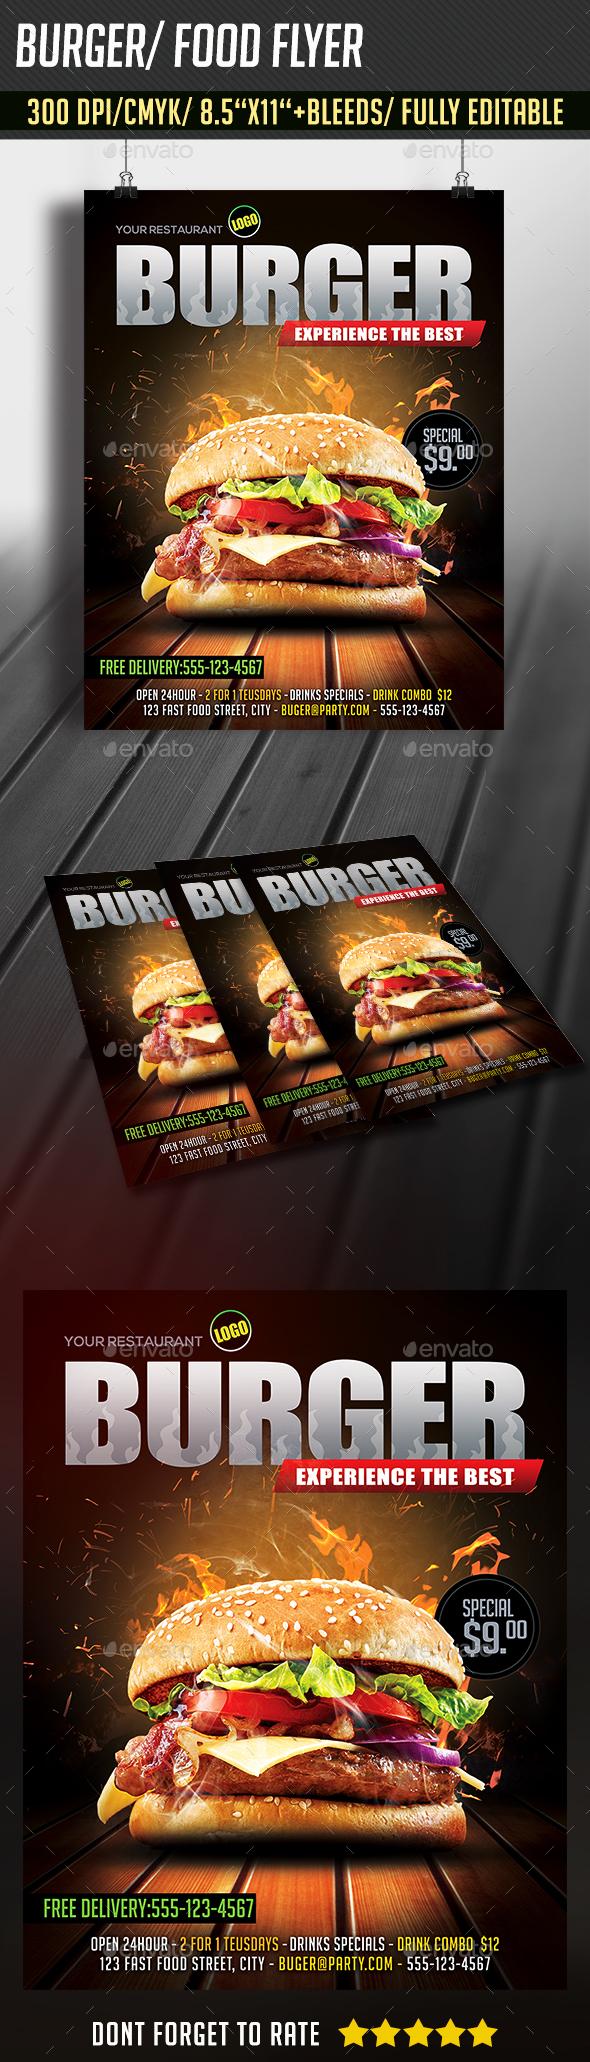 Burger/ Food Flyer - Restaurant Flyers